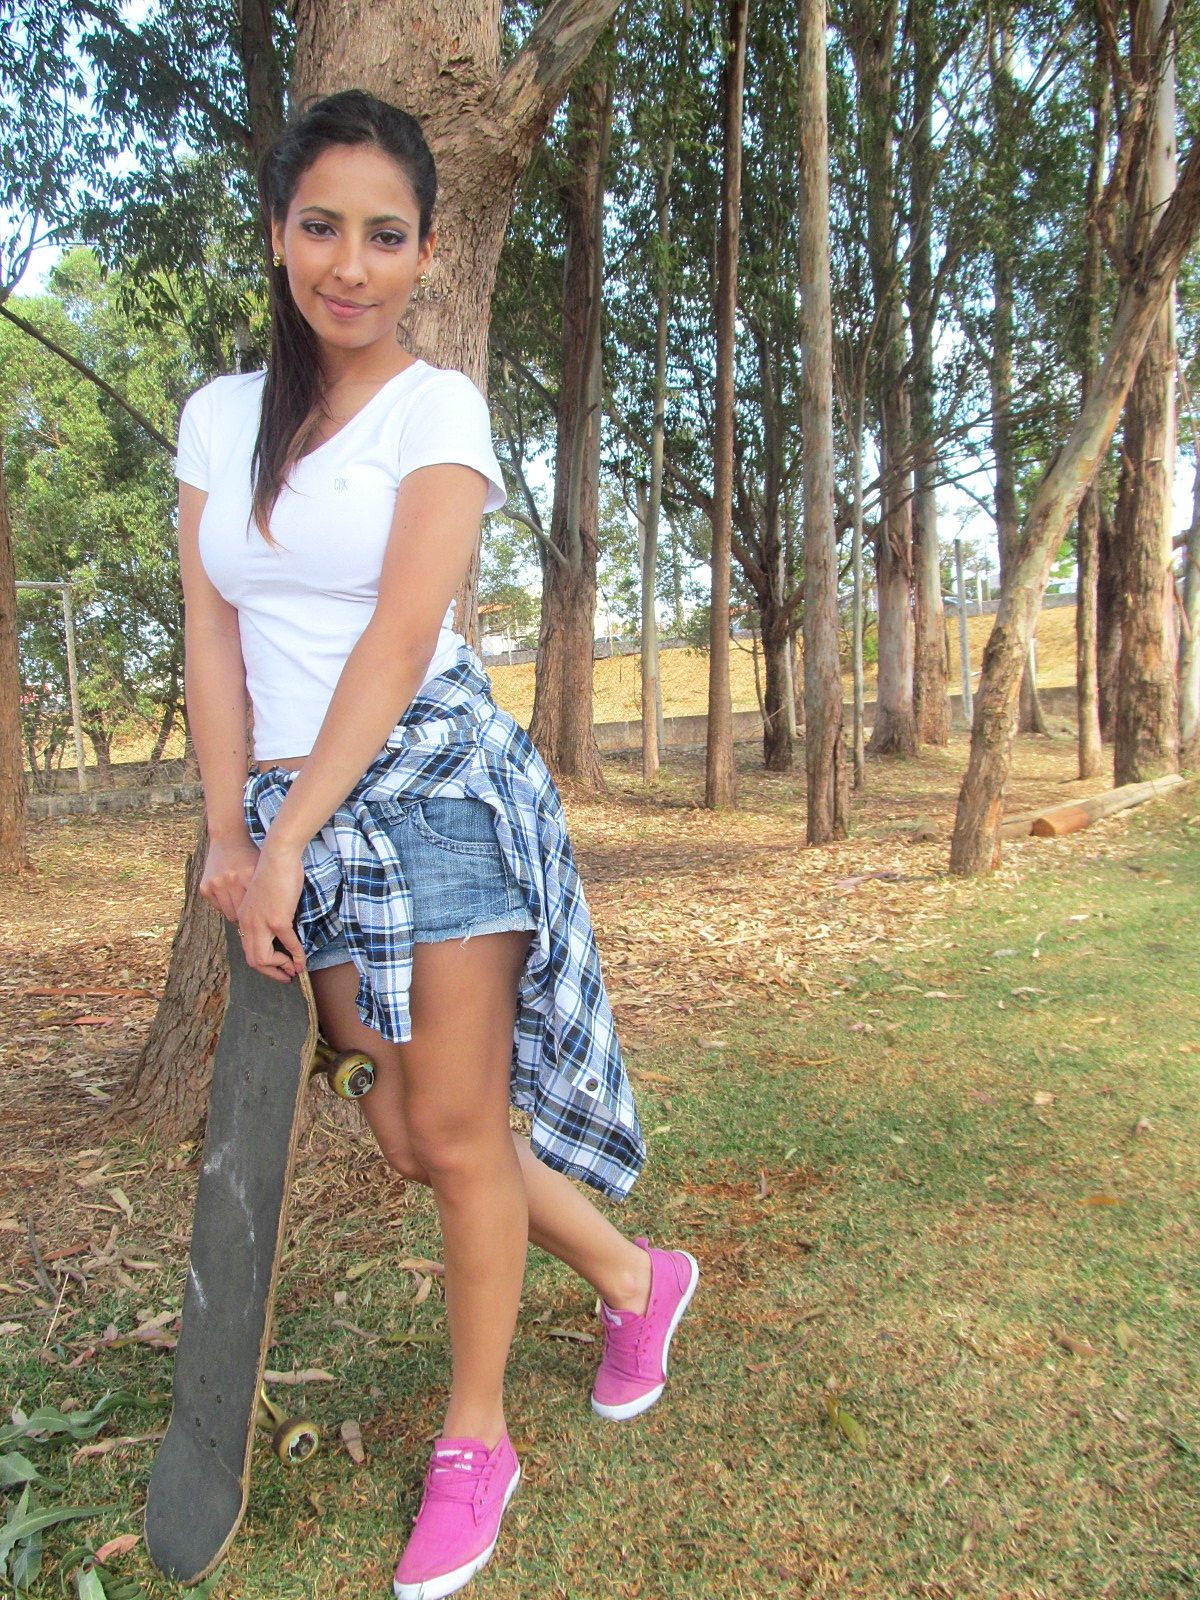 http://www.laialamargonar.com/look-skater-girl/